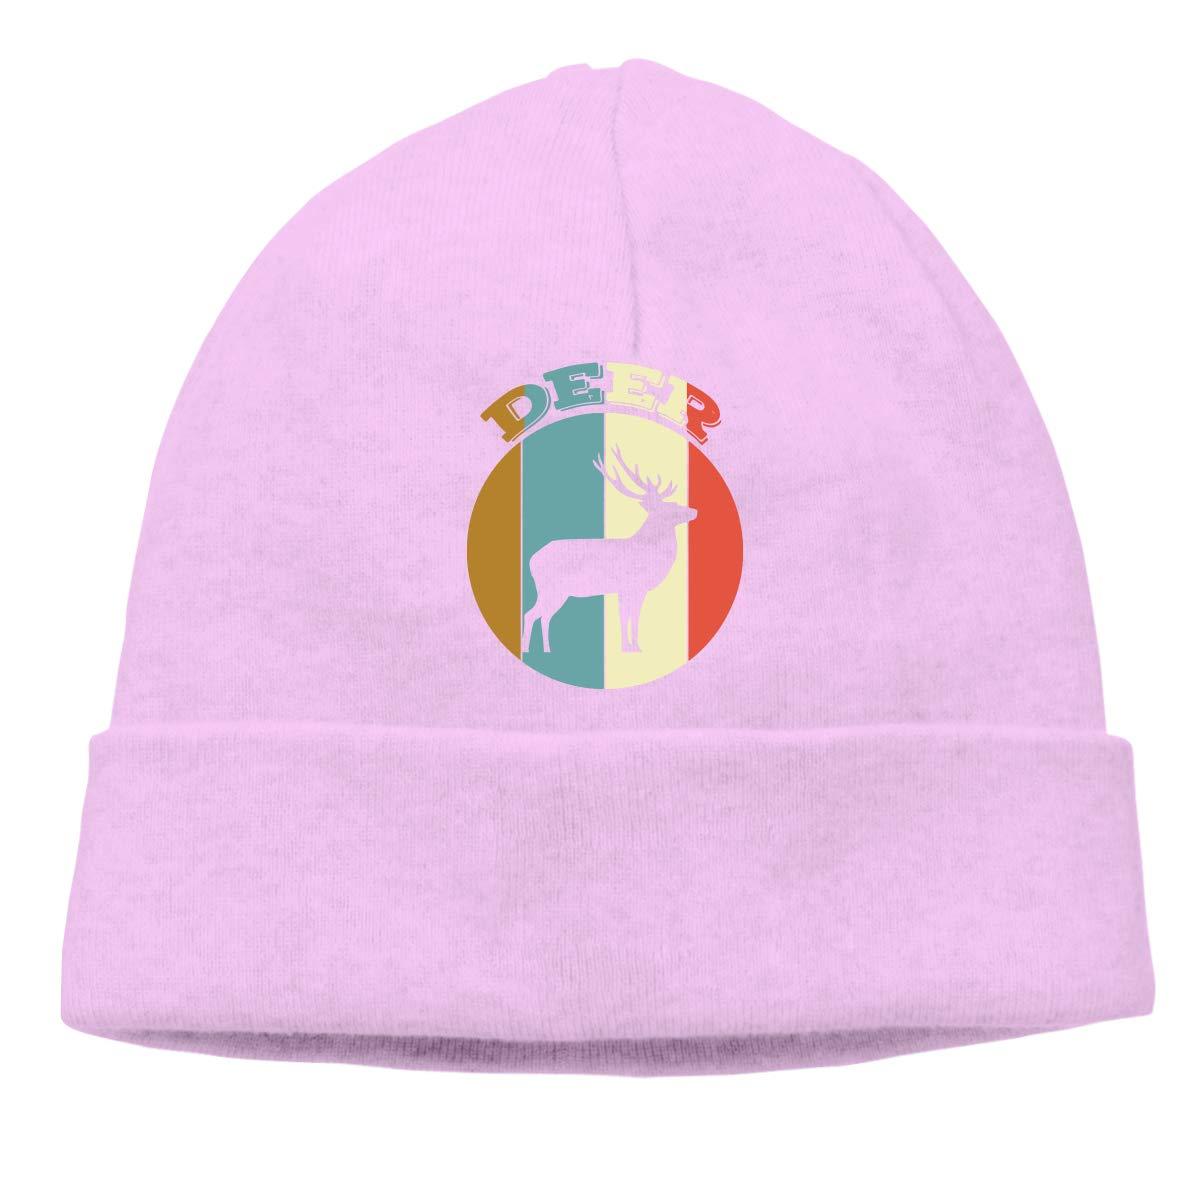 COLLJL8 Unisex Deer Retro Outdoor Warm Beanies Hat Soft Winter Skull Caps